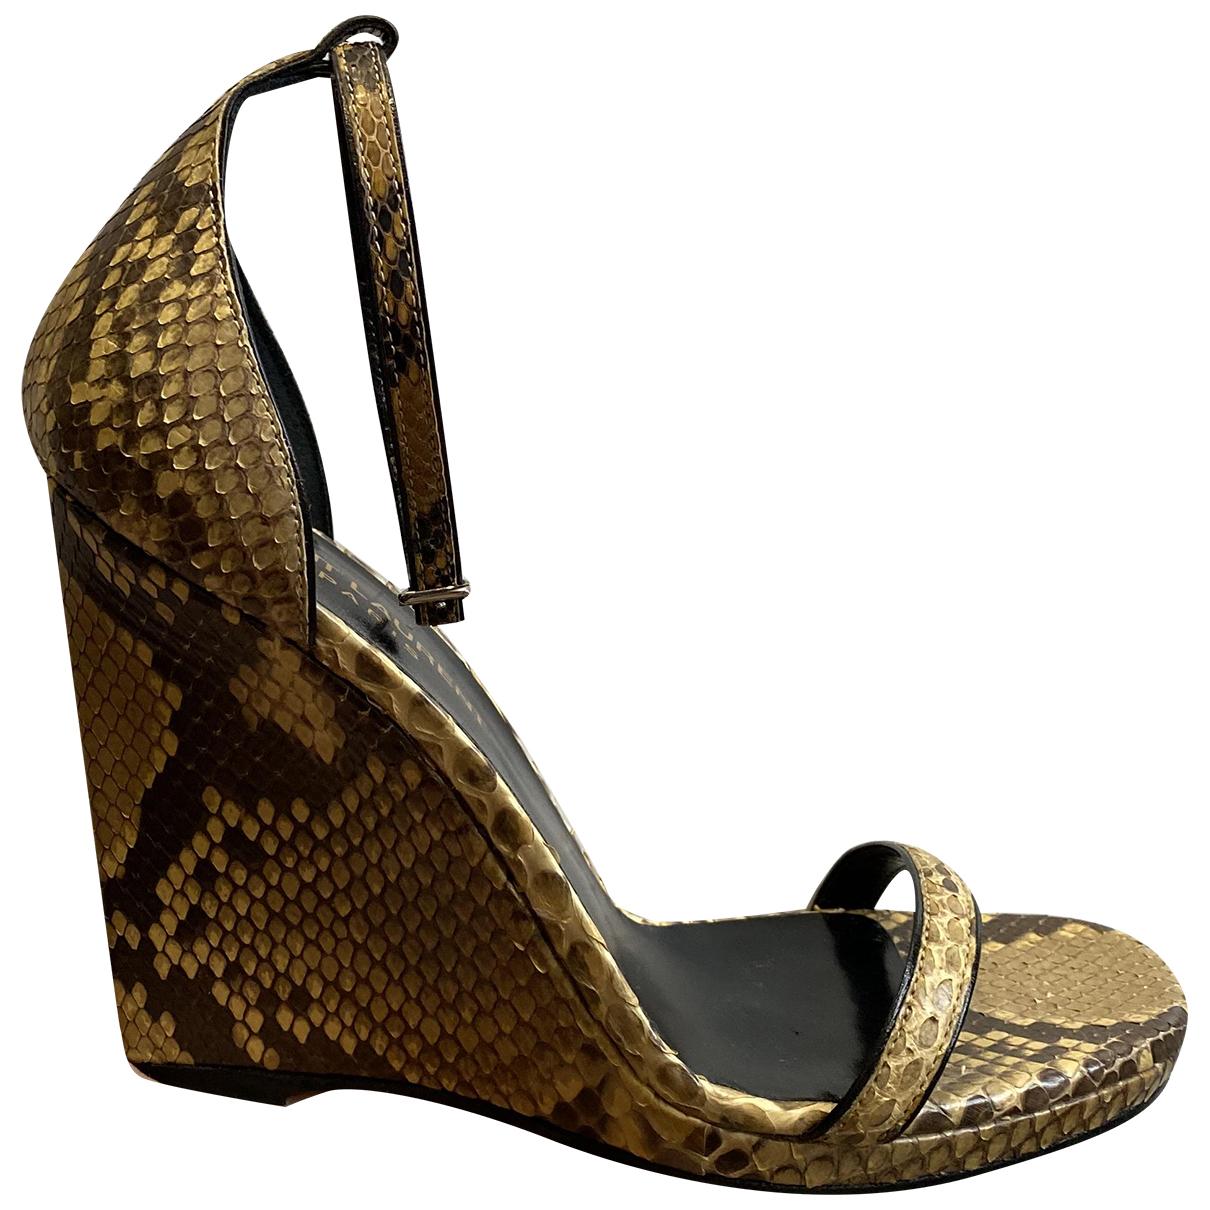 Saint Laurent N Beige Water snake Sandals for Women 36.5 EU